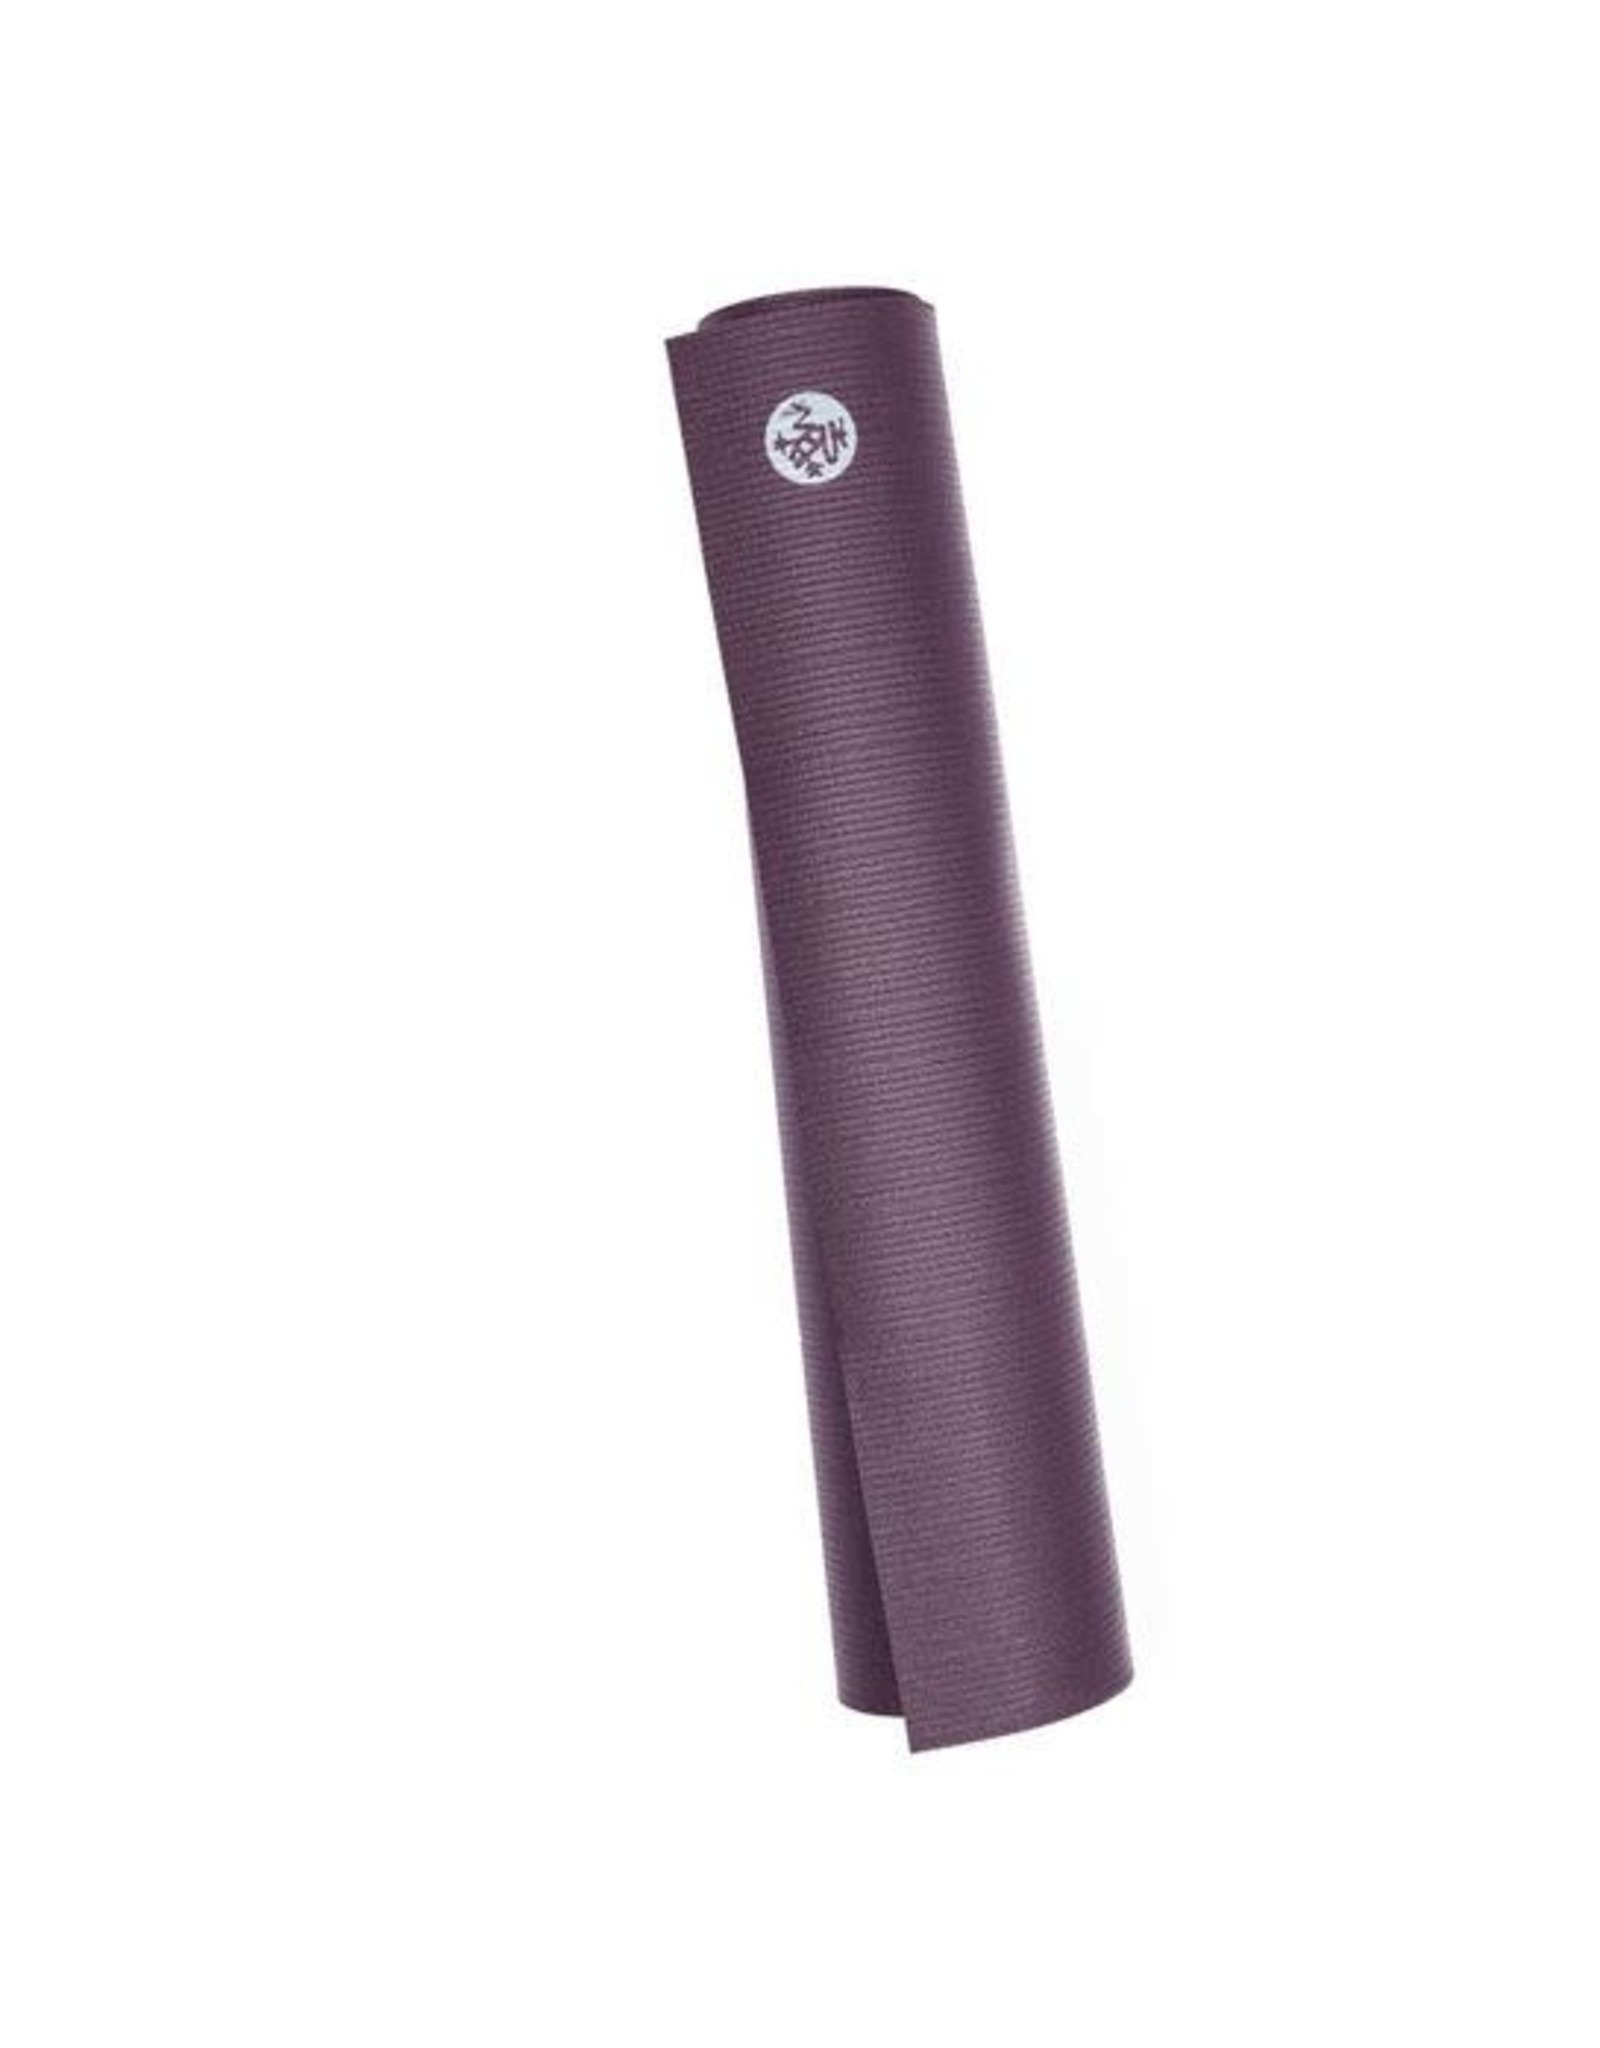 Manduka PRO Lite Mat 71/Indulge 4.7mm